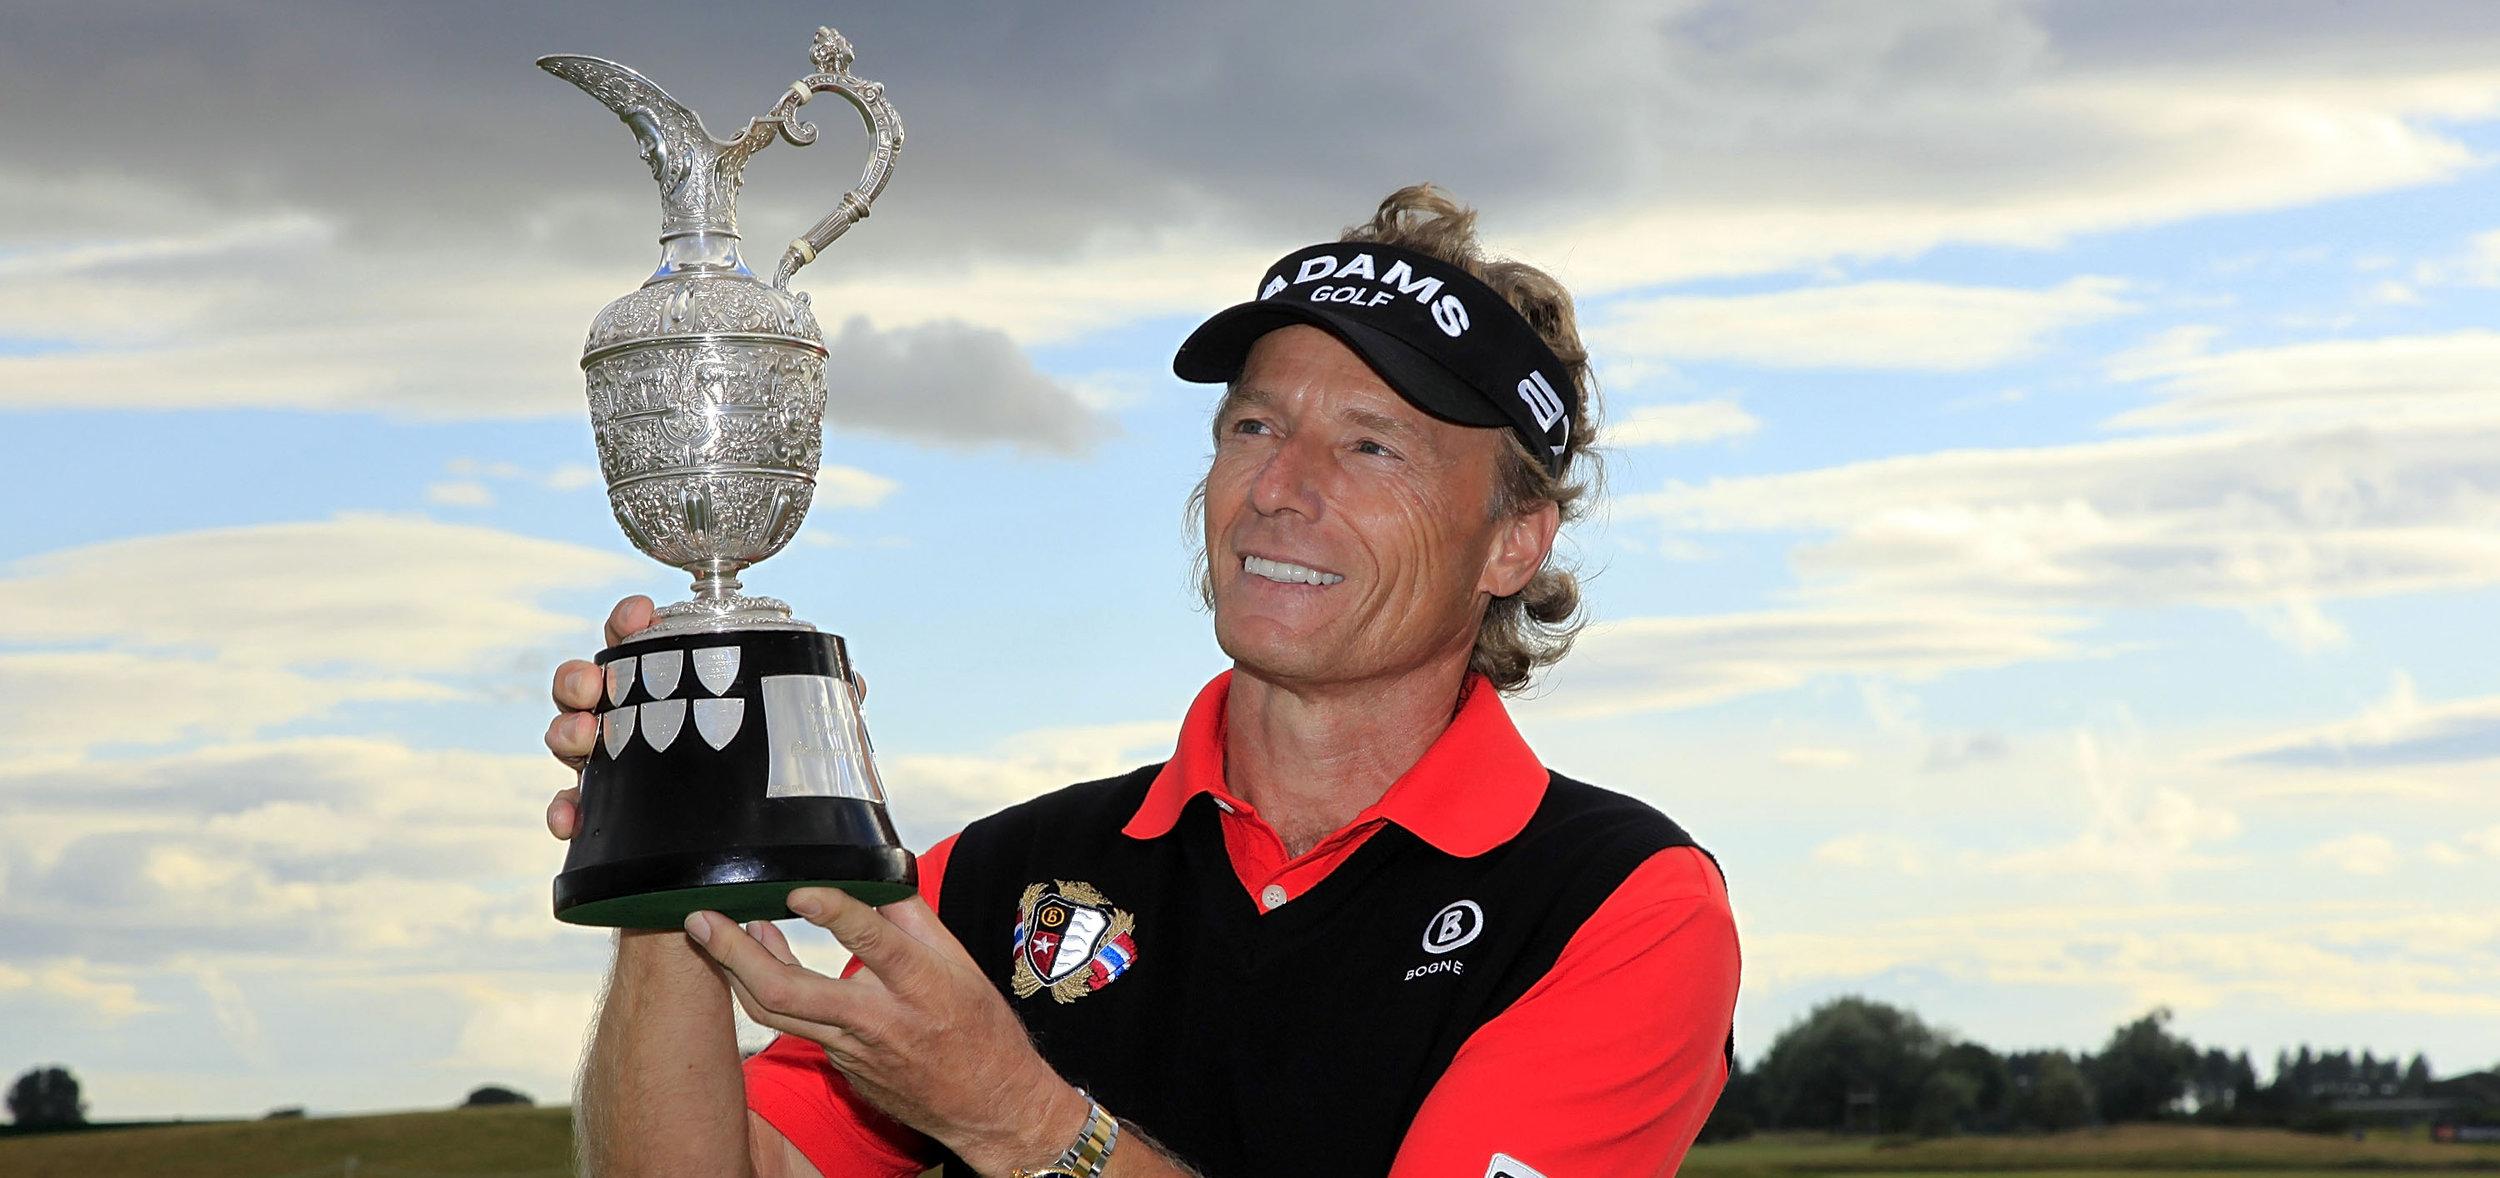 Bernhard Langer - Professional Golfer, two time Masters winner on the PGA Tour, winner of the 2010 Senior Open Championship and U.S. Senior Open, 2014 Constellation Senior Players Championship and the 2014 Senior Open Championship.